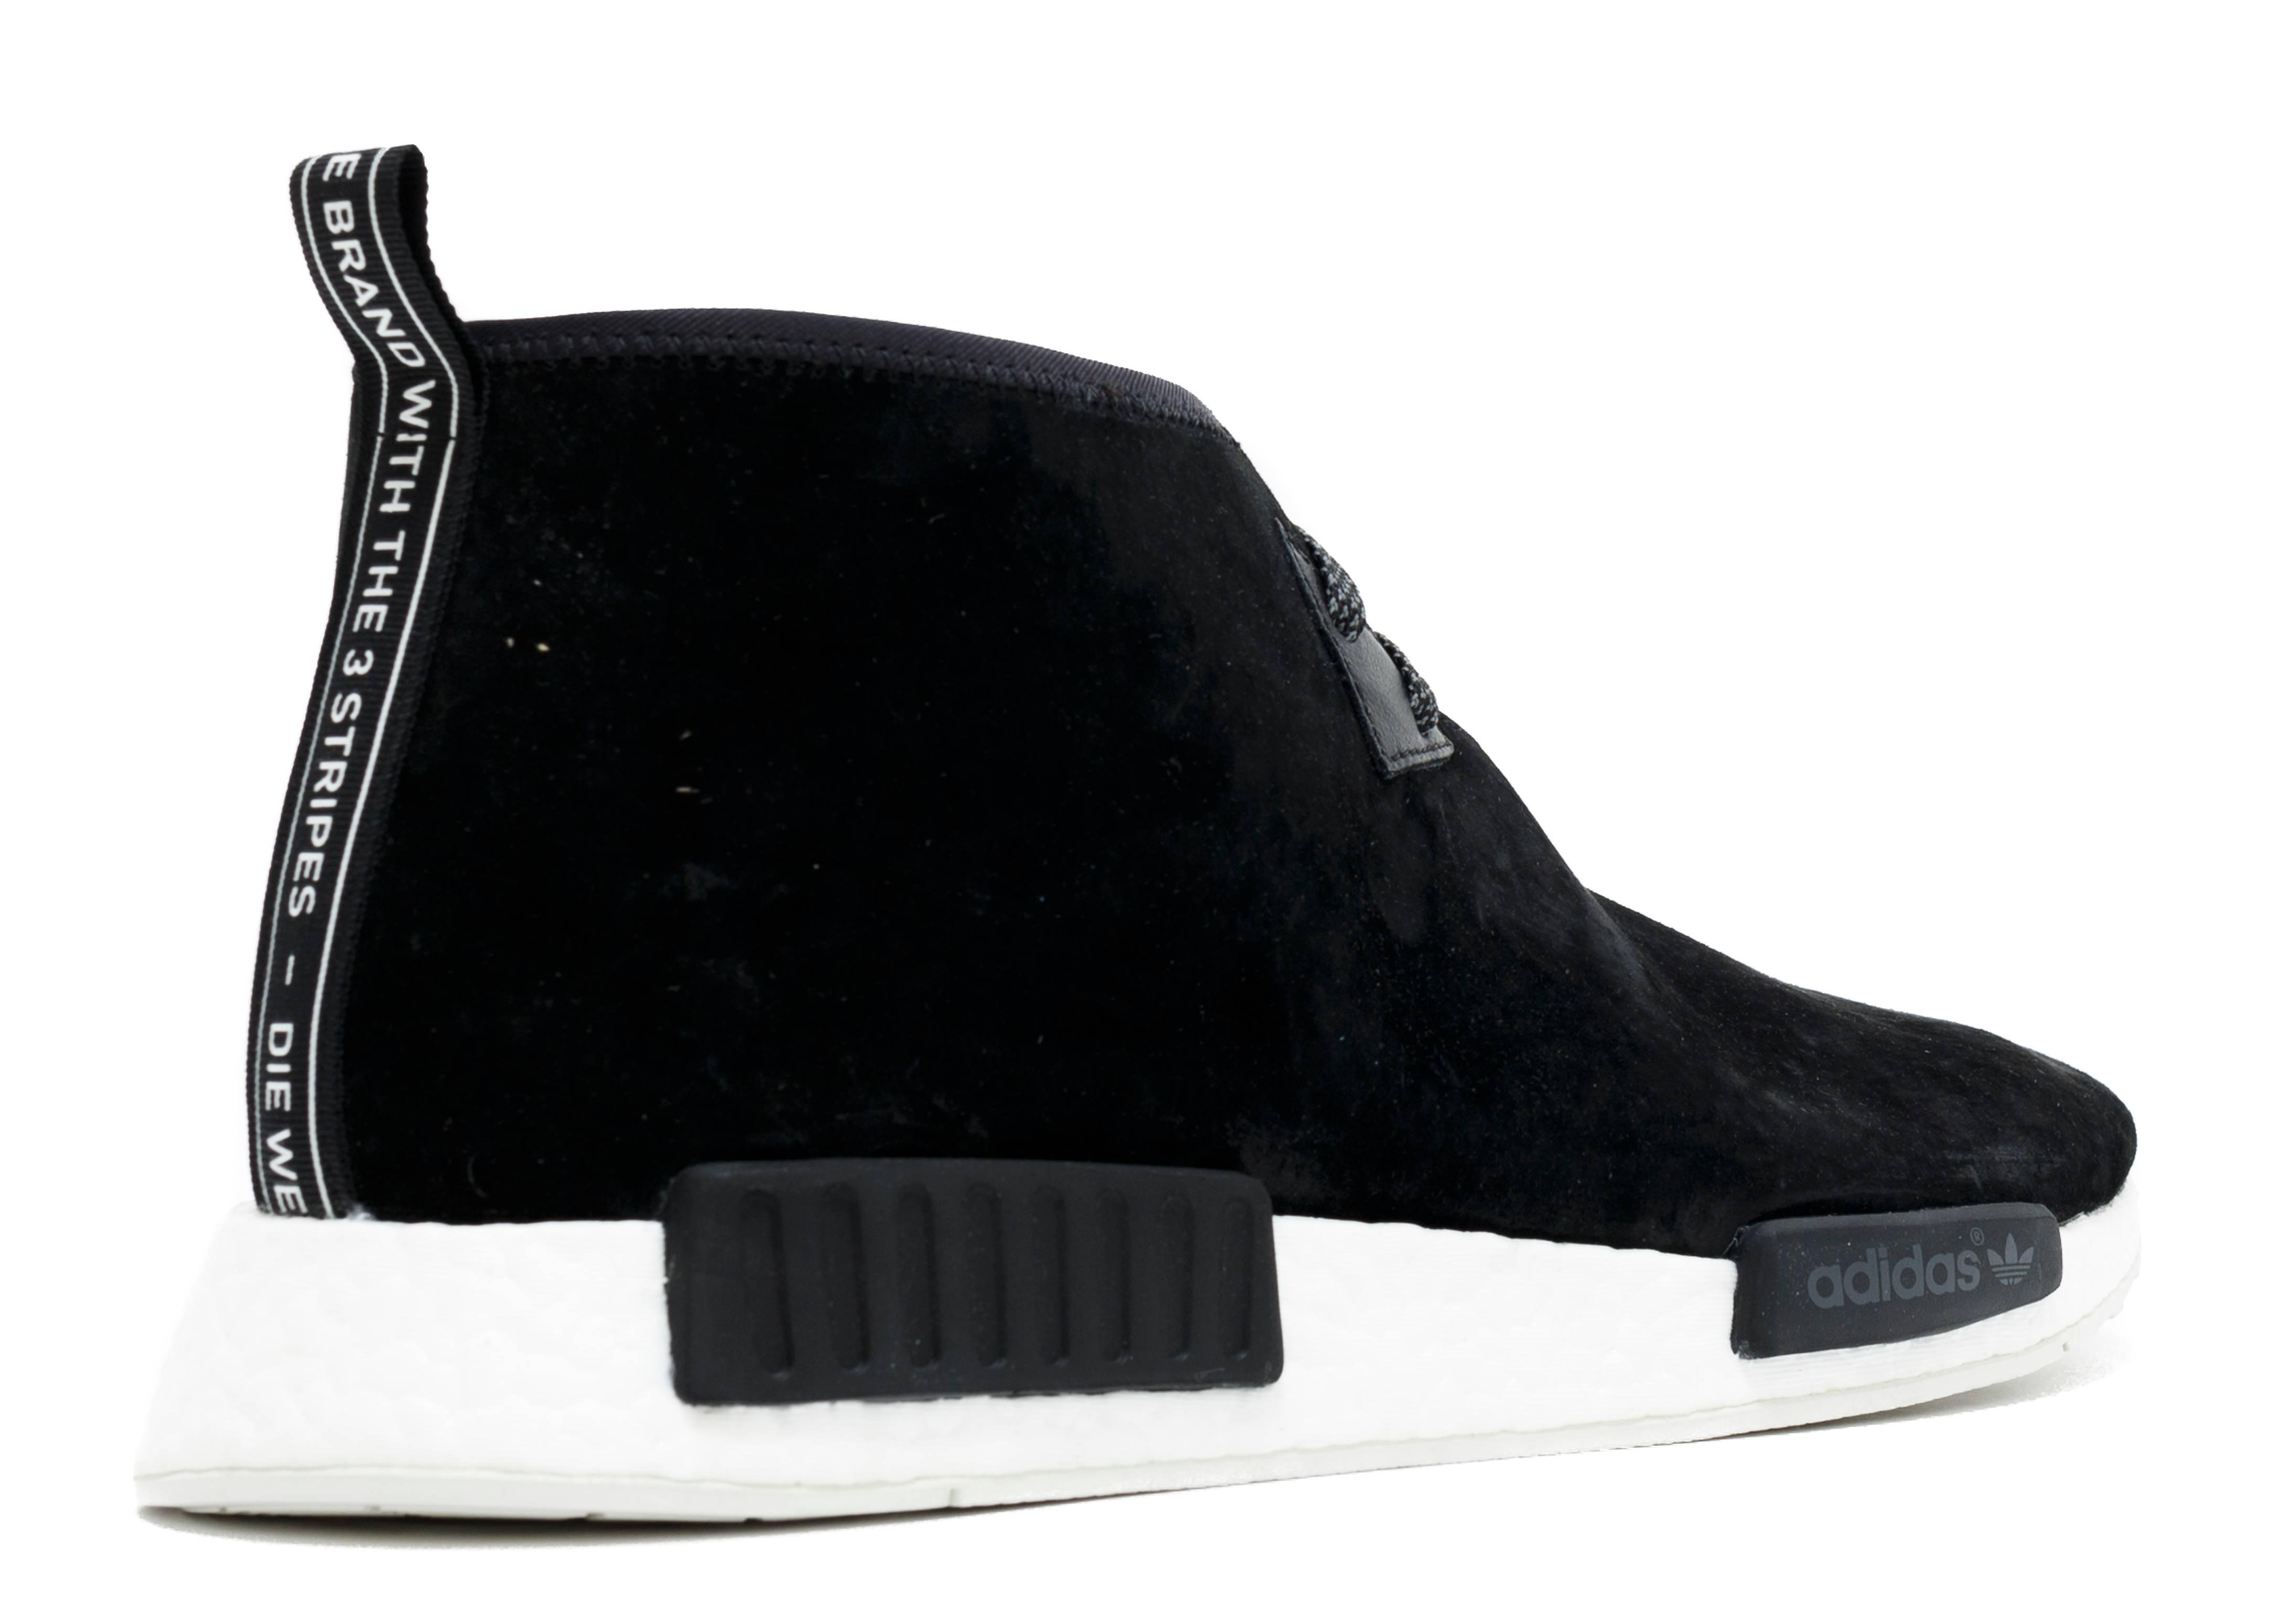 118302f573a3   Woy968 Adidas Originals NMD C1 Chukka OG Core Black   Lush